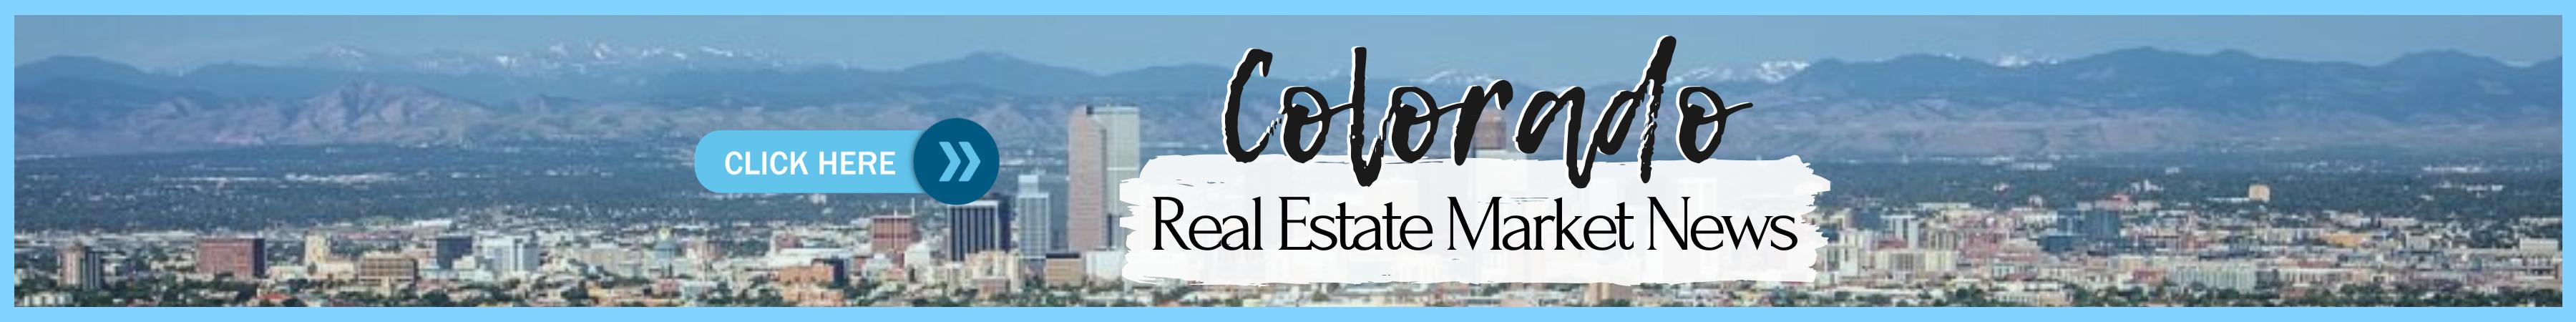 Colorado Real Estate News